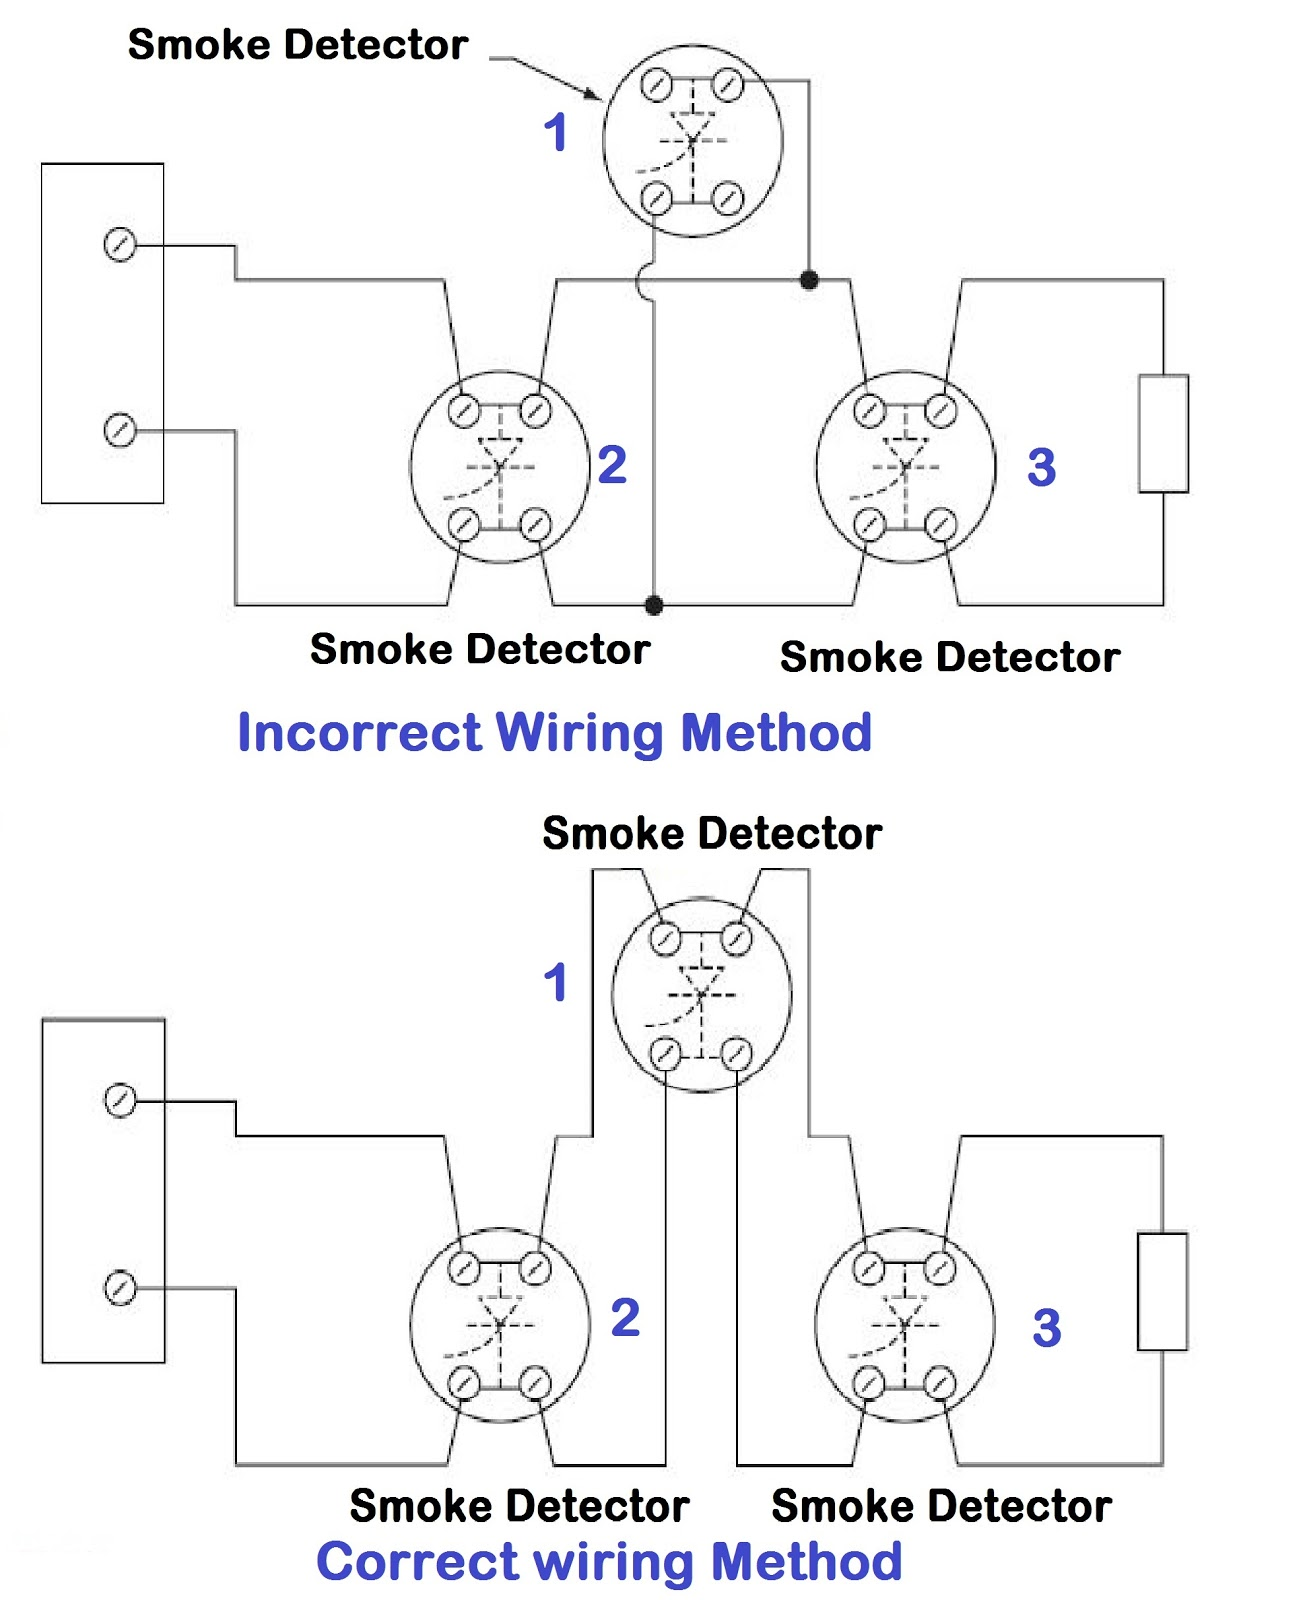 Smoke Detectors Wiring Diagram 2008 F150 Detector Technique